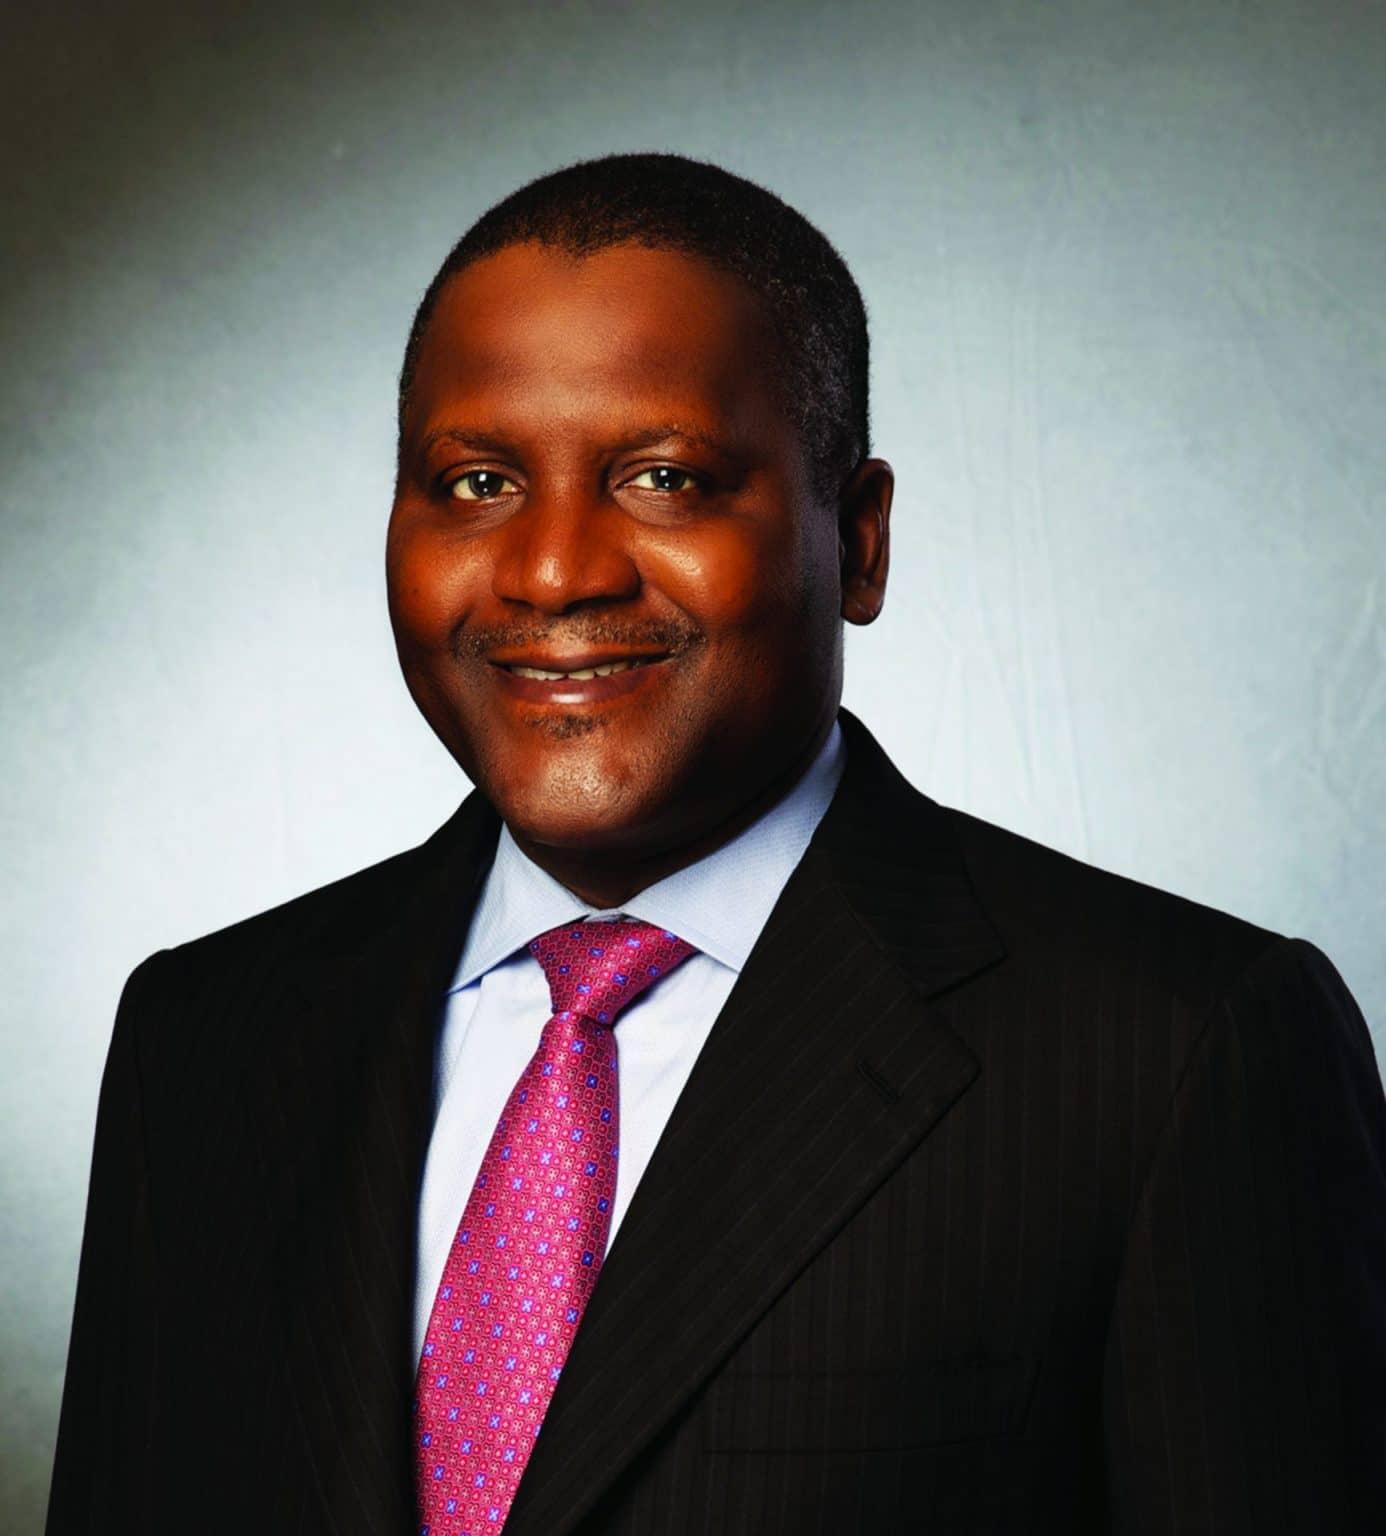 The Forbes Billionaires List: Africa's Billionaires 2020 - CNBC Africa